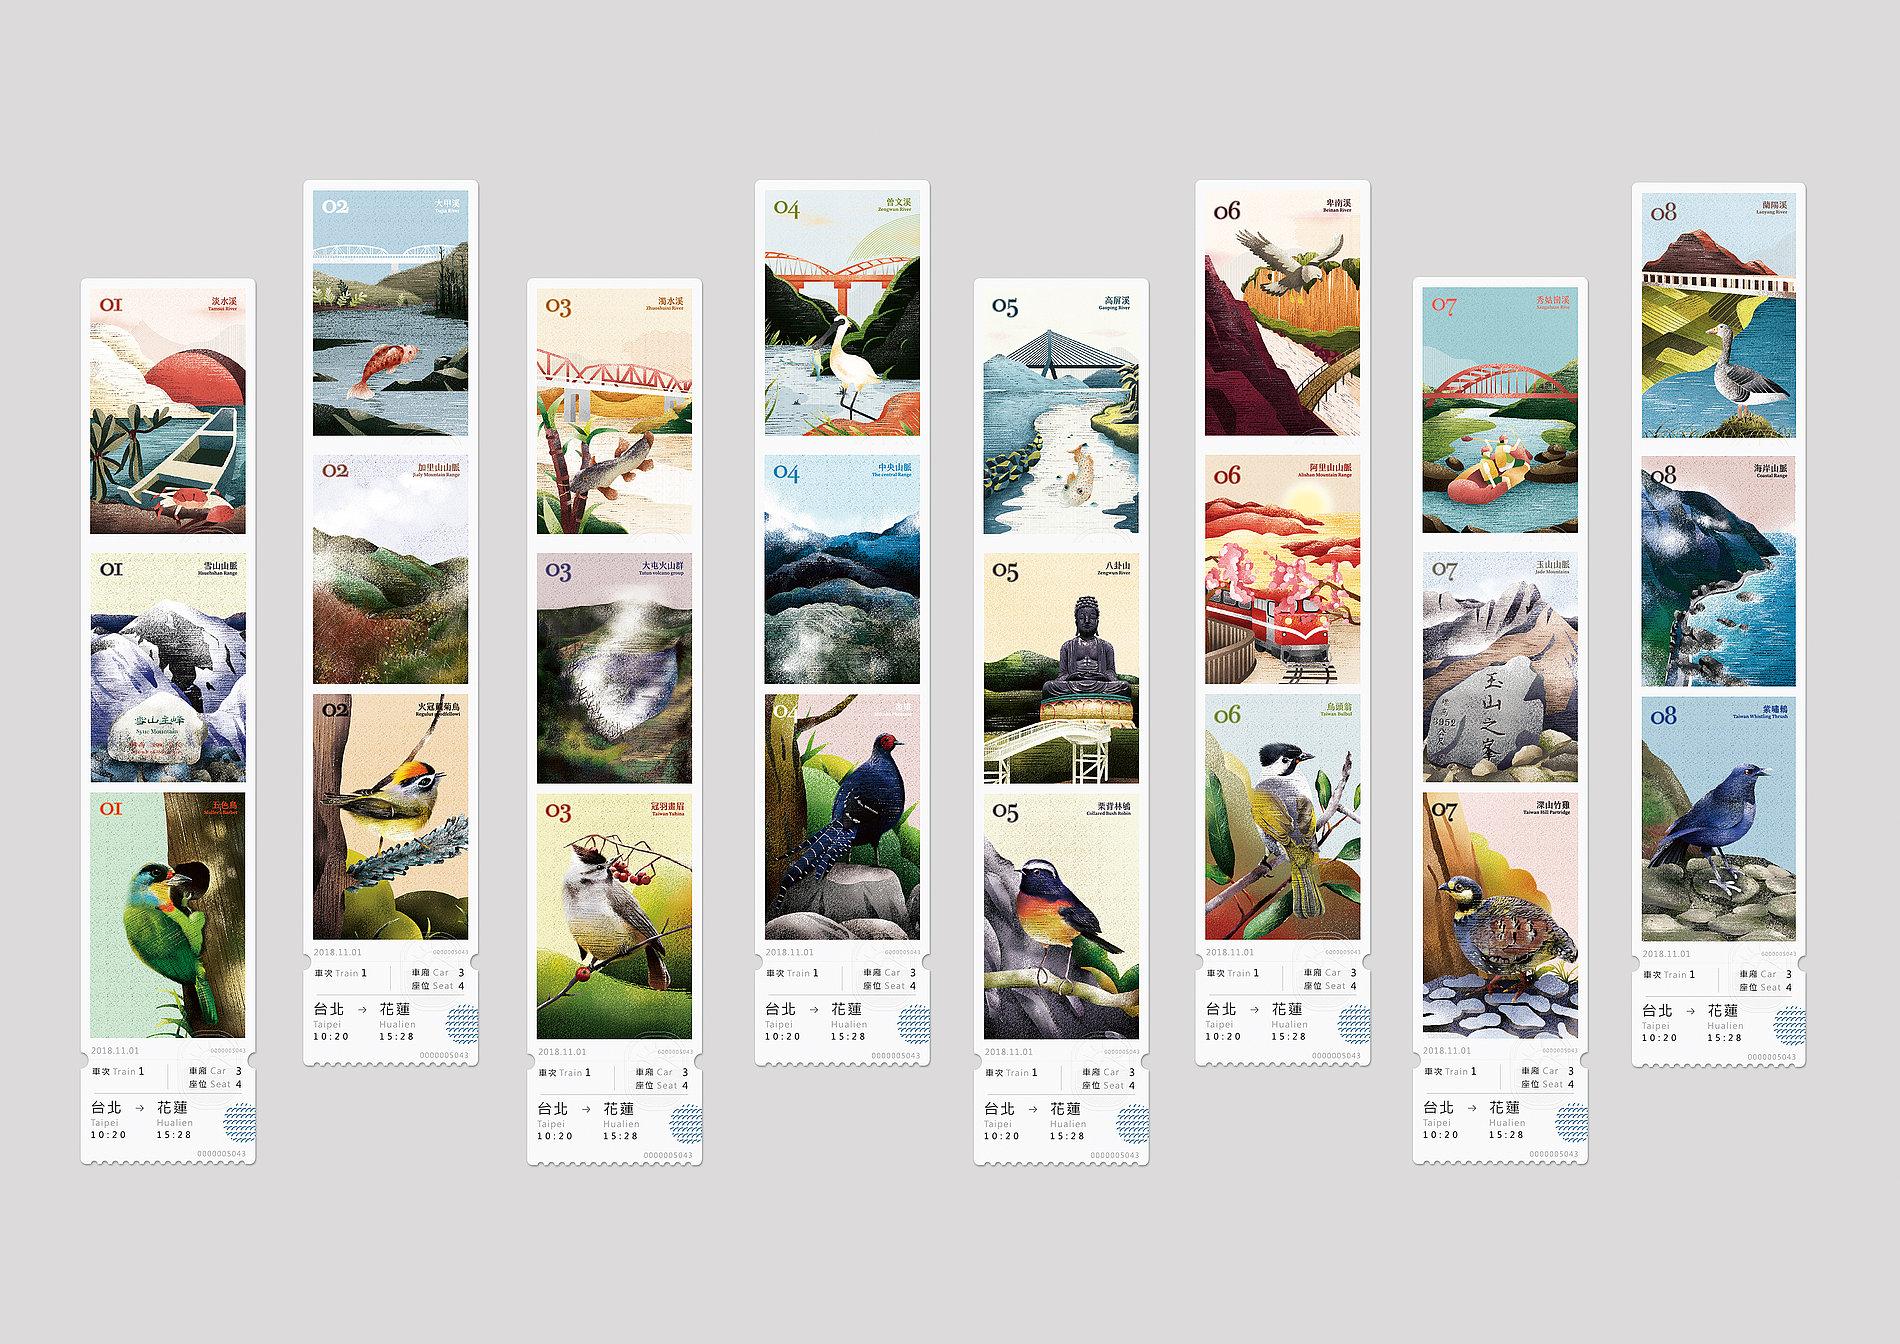 Formosa – Rivers, Mountains, Birds | Red Dot Design Award